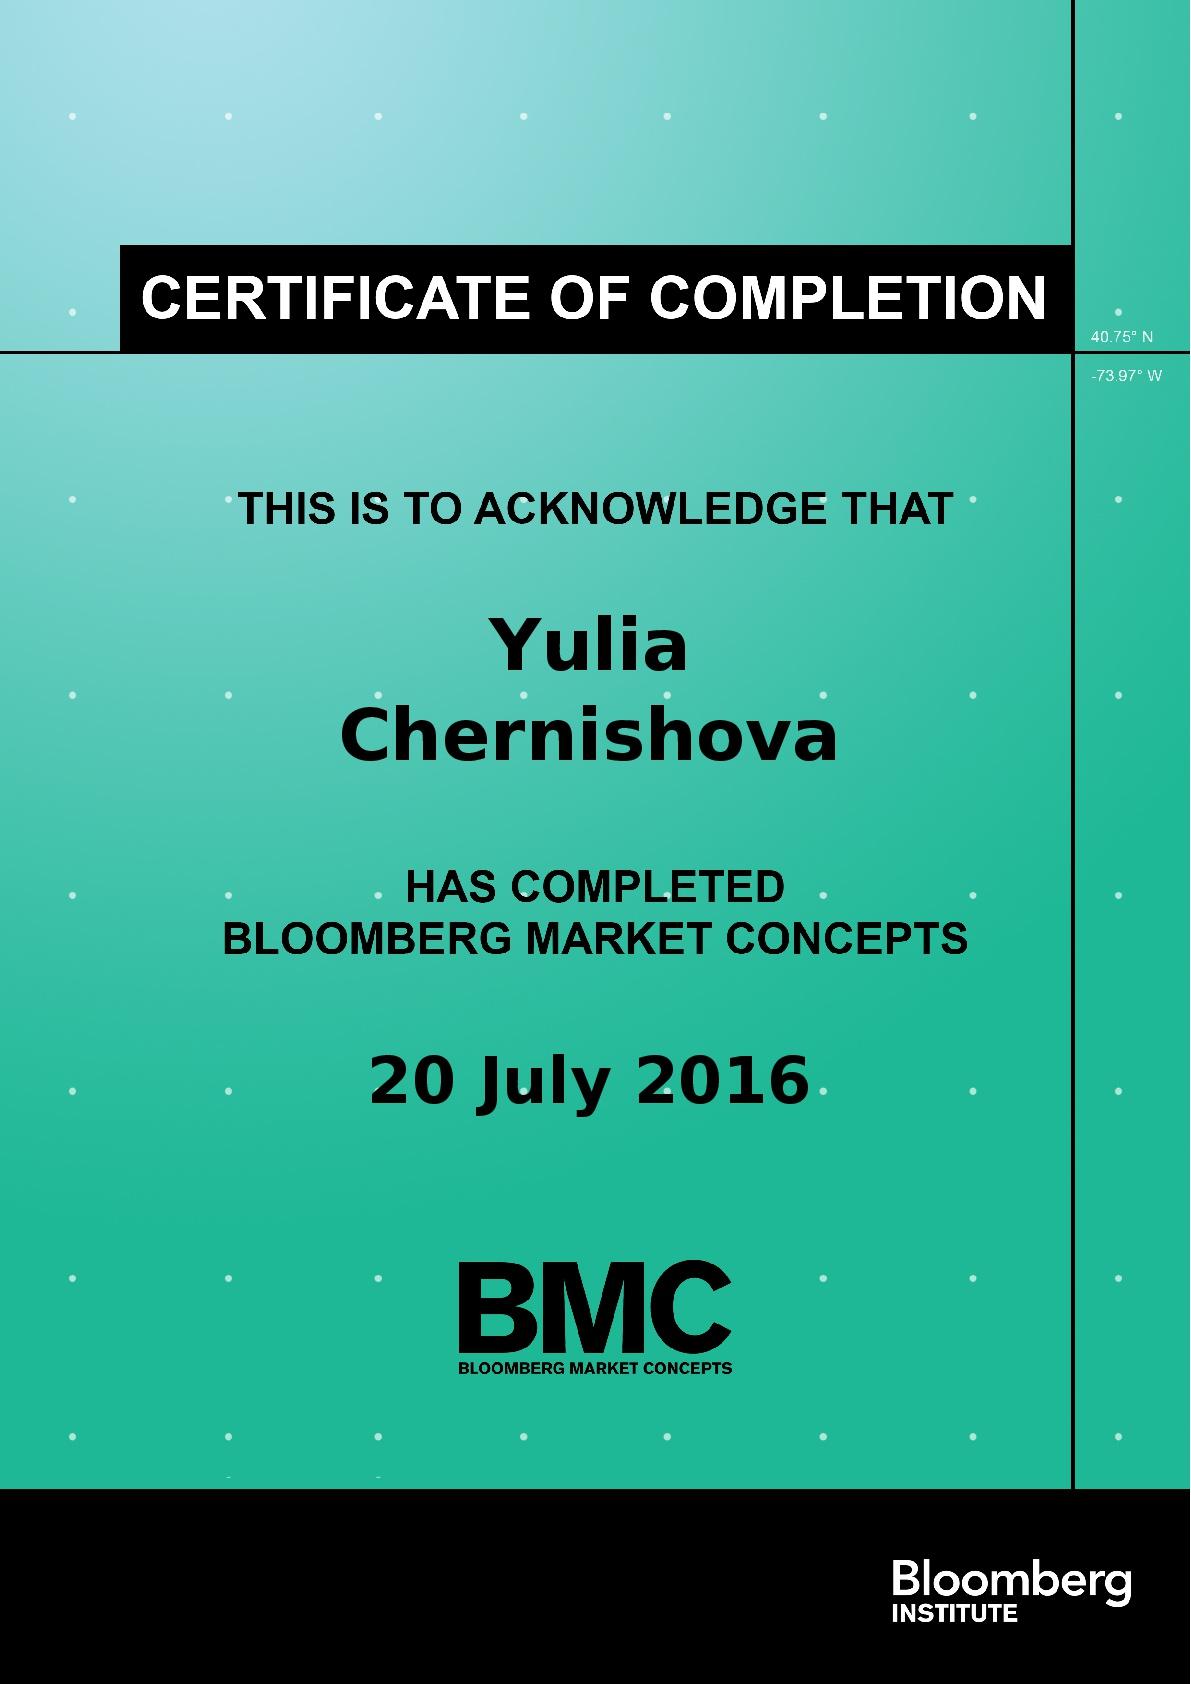 Bloomberg Certificate for Yulia Chernishova